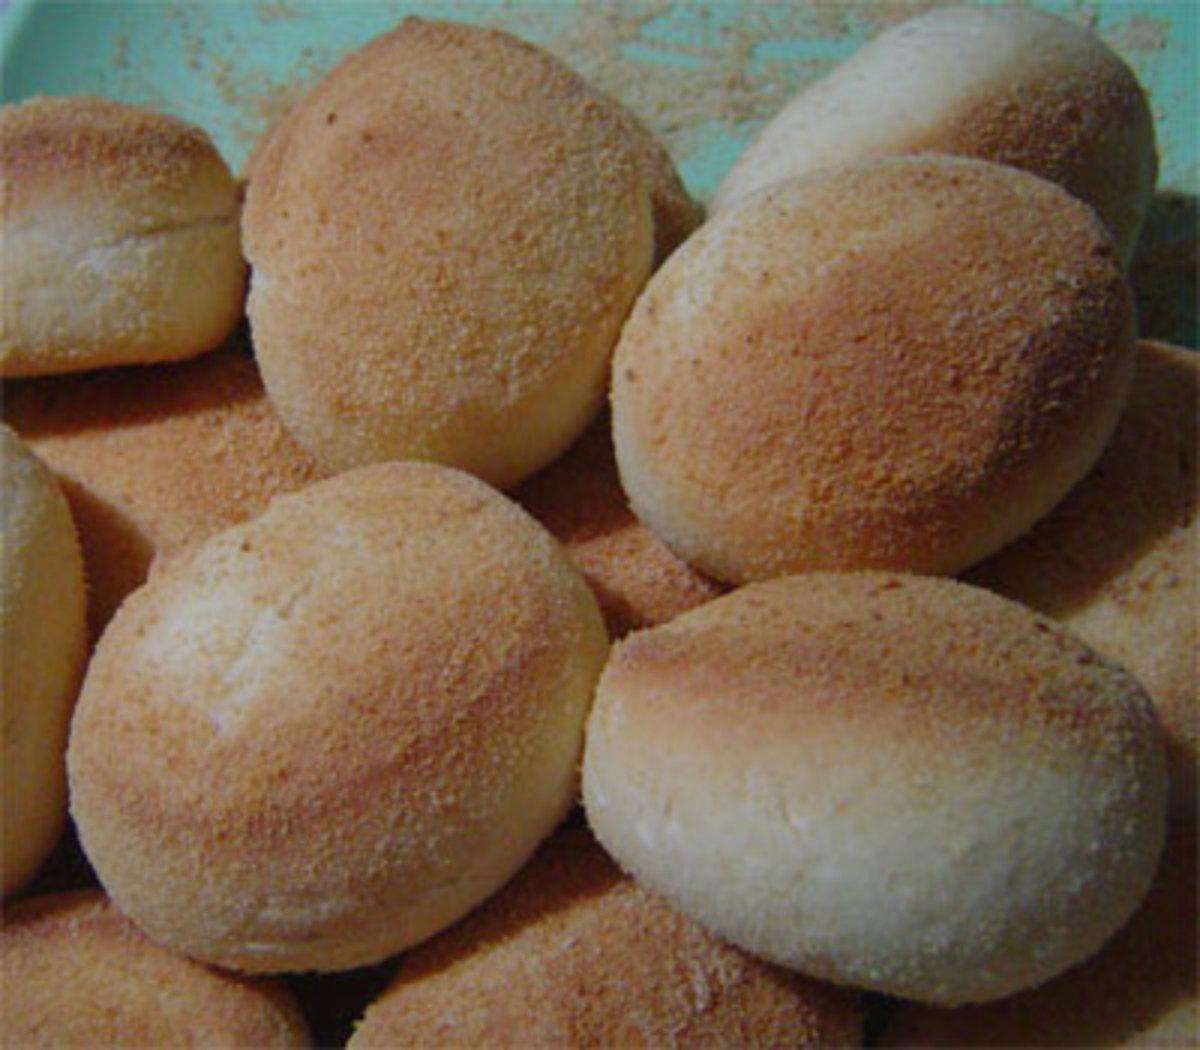 pandesal, flour dough bread -- basic Filipino bread